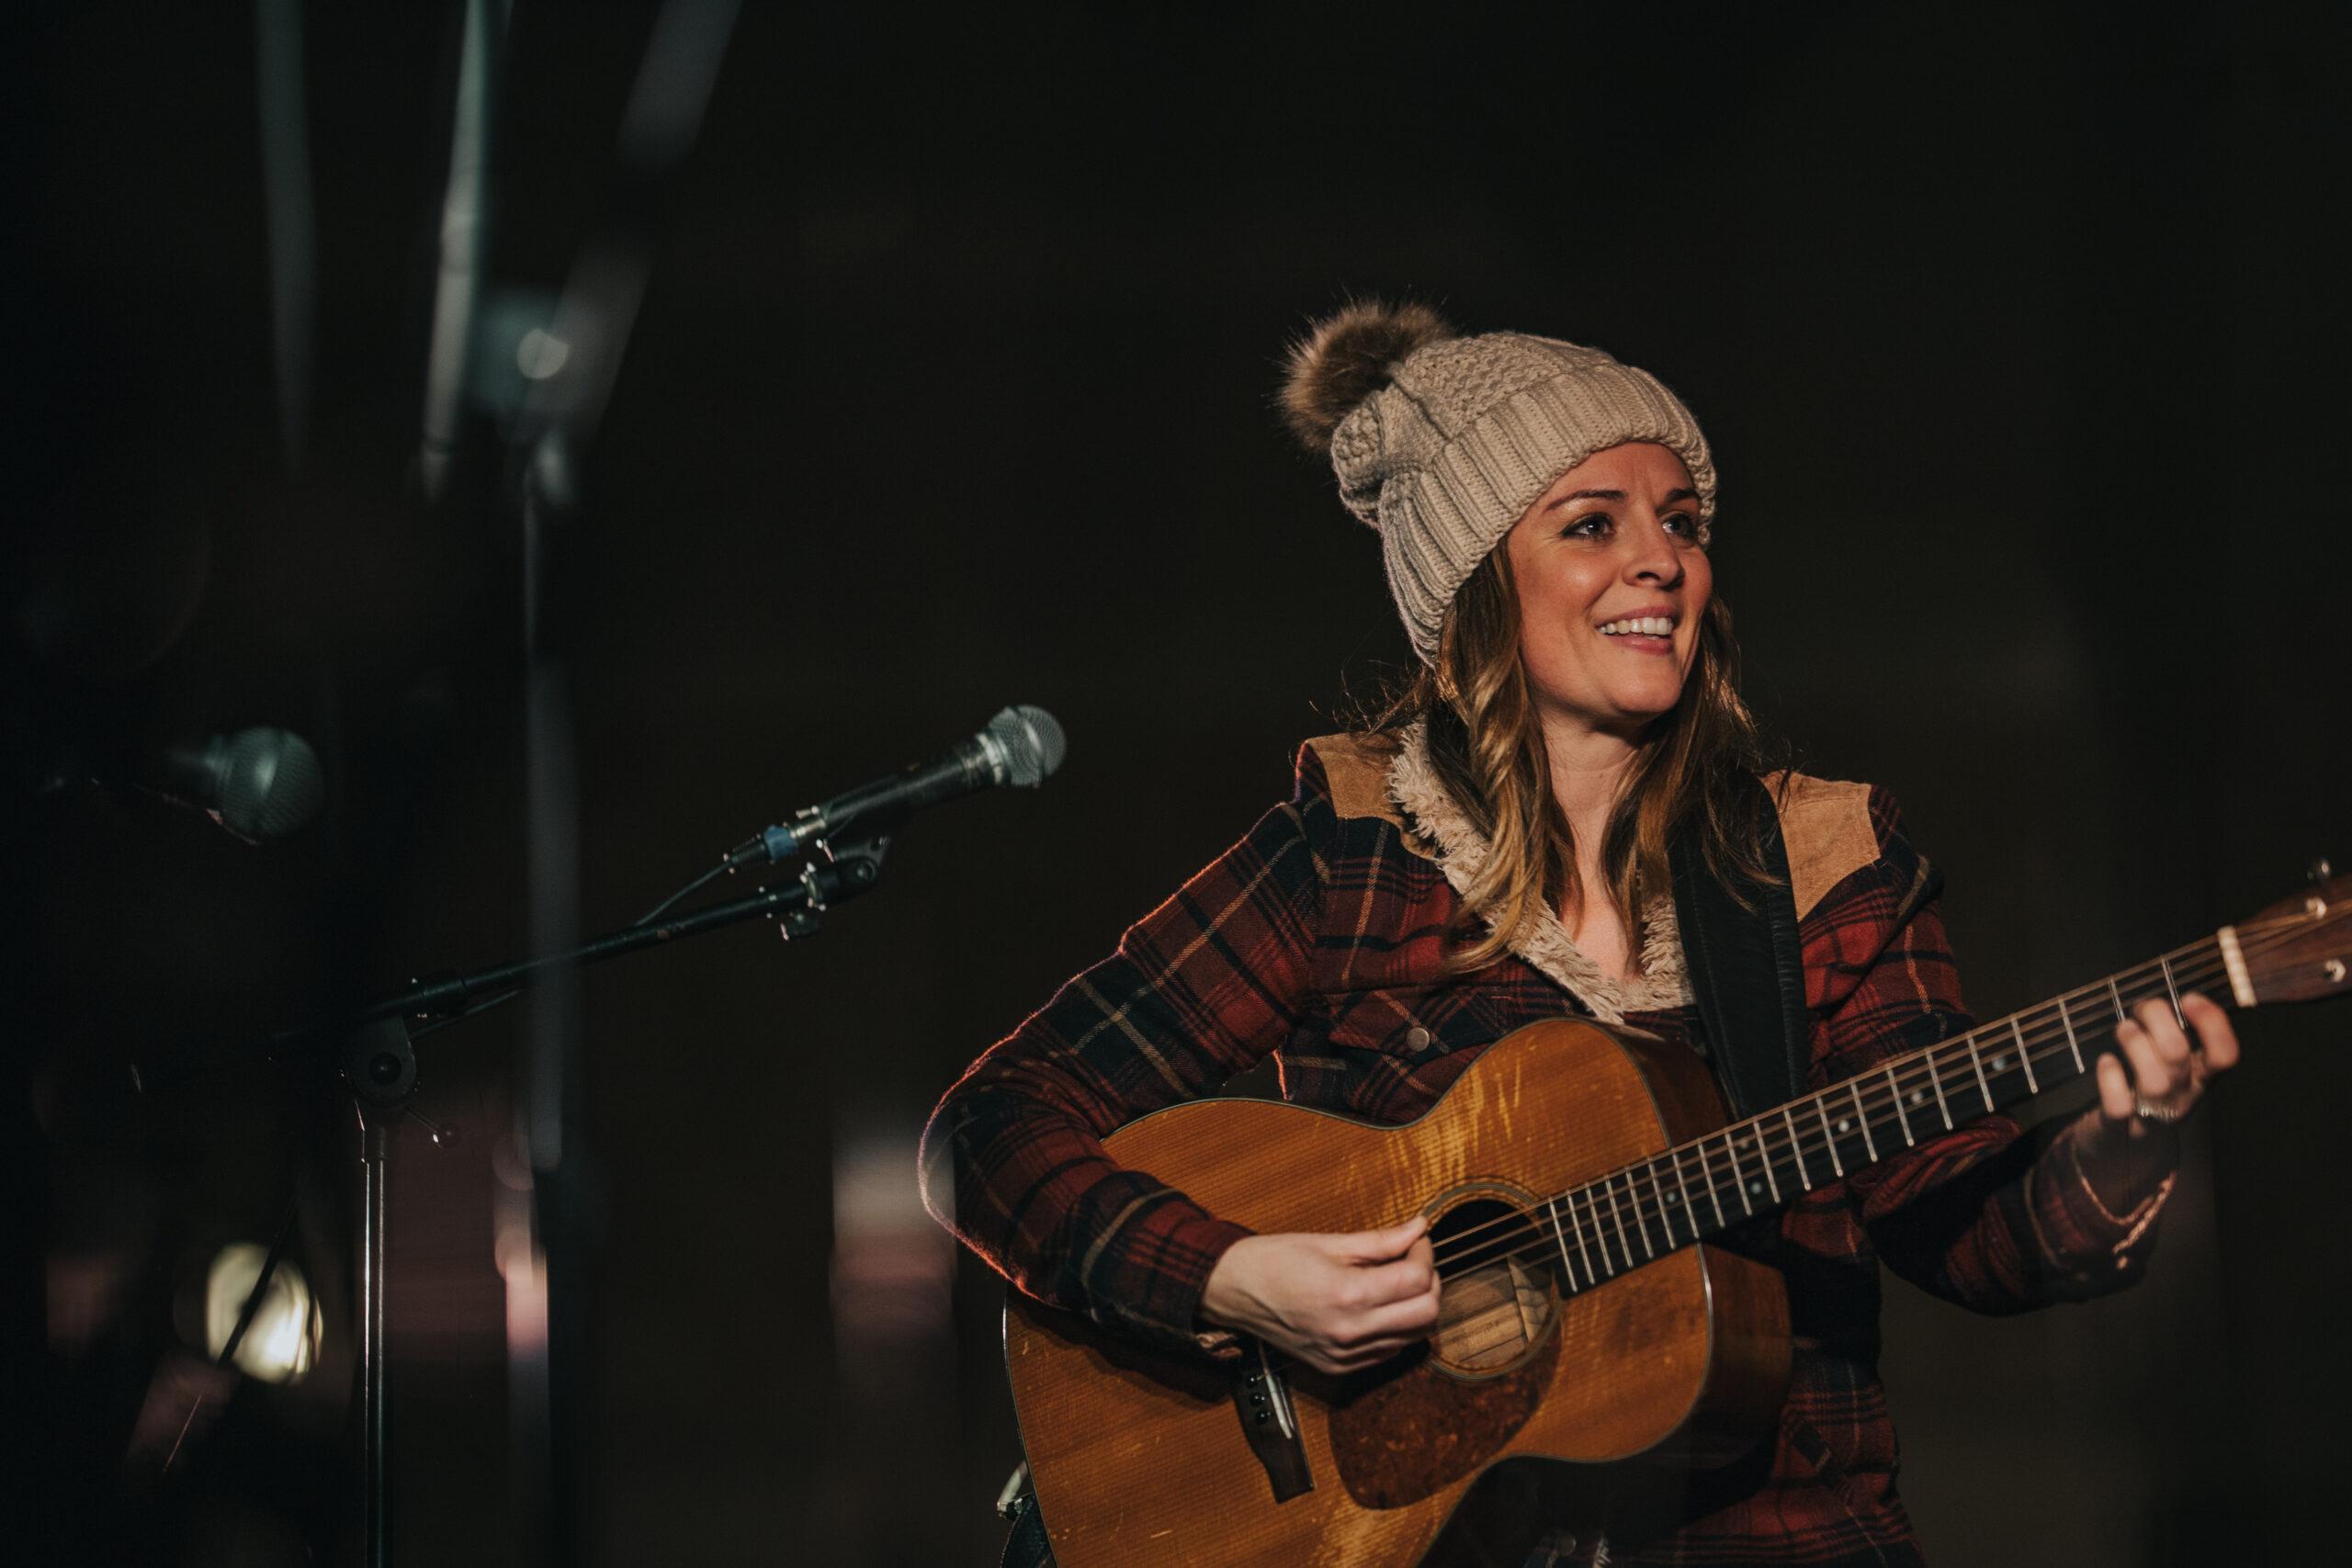 Musician Monica Rizzio performing at the 2018 Cape Cod Christmas Cavalcade